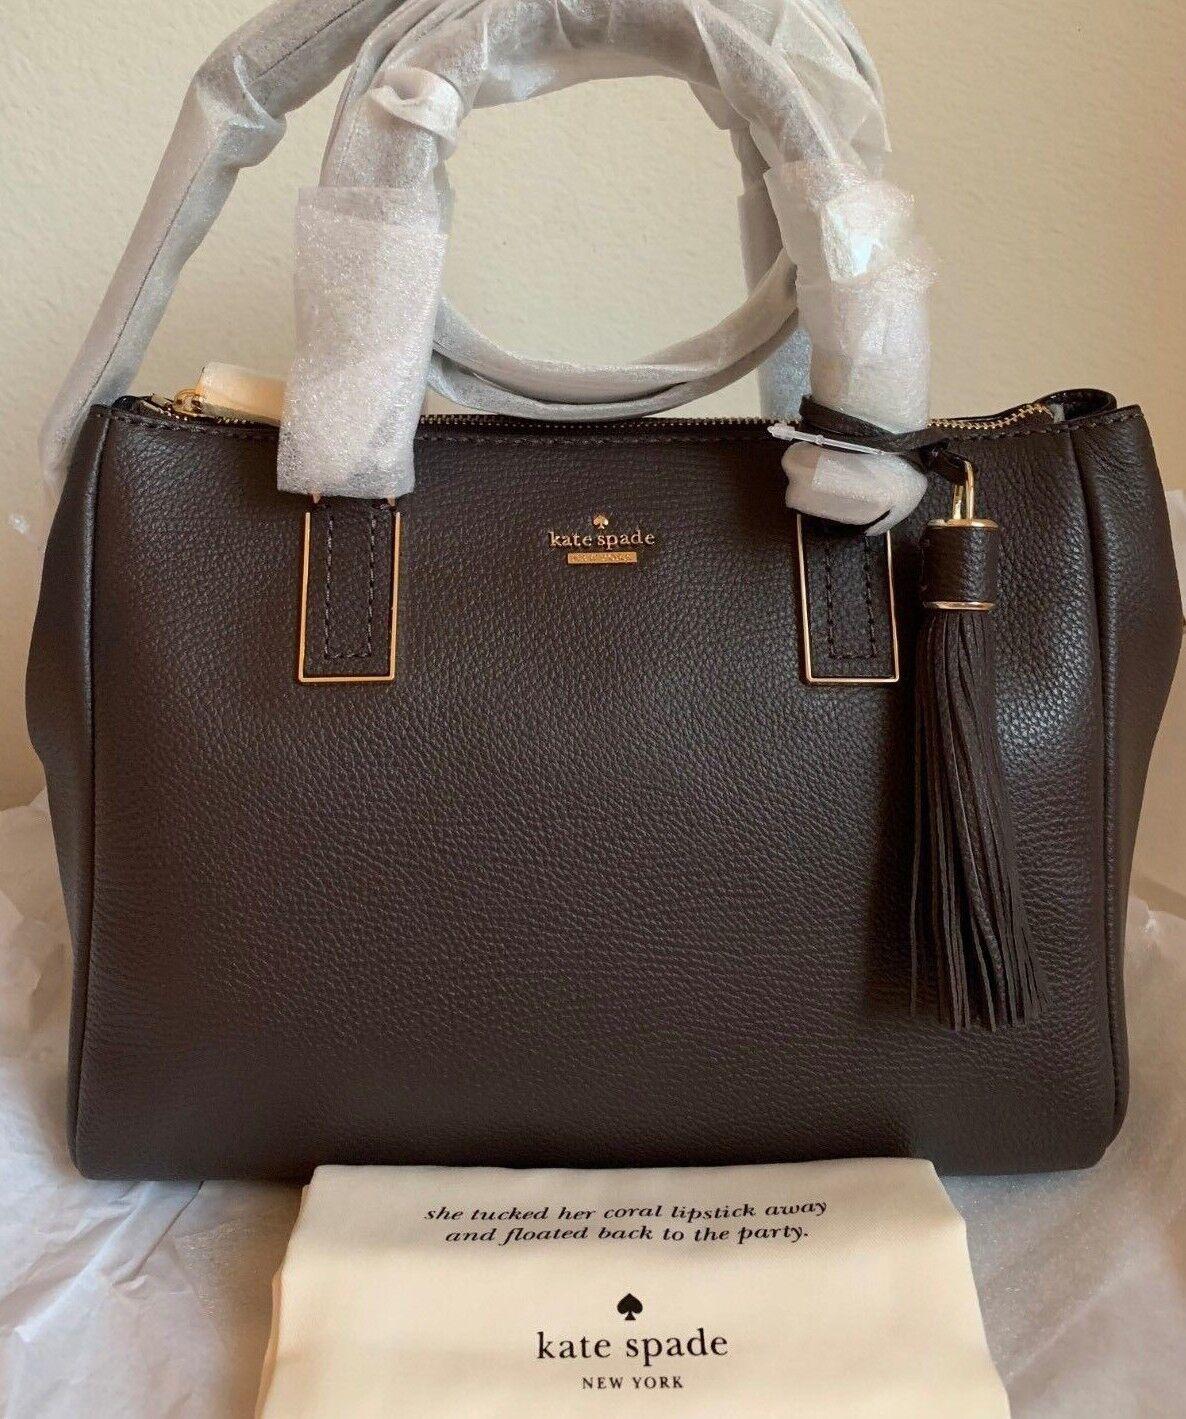 NWT Kate Spade Kingston Drive Alena Leather Satchel Bag $398